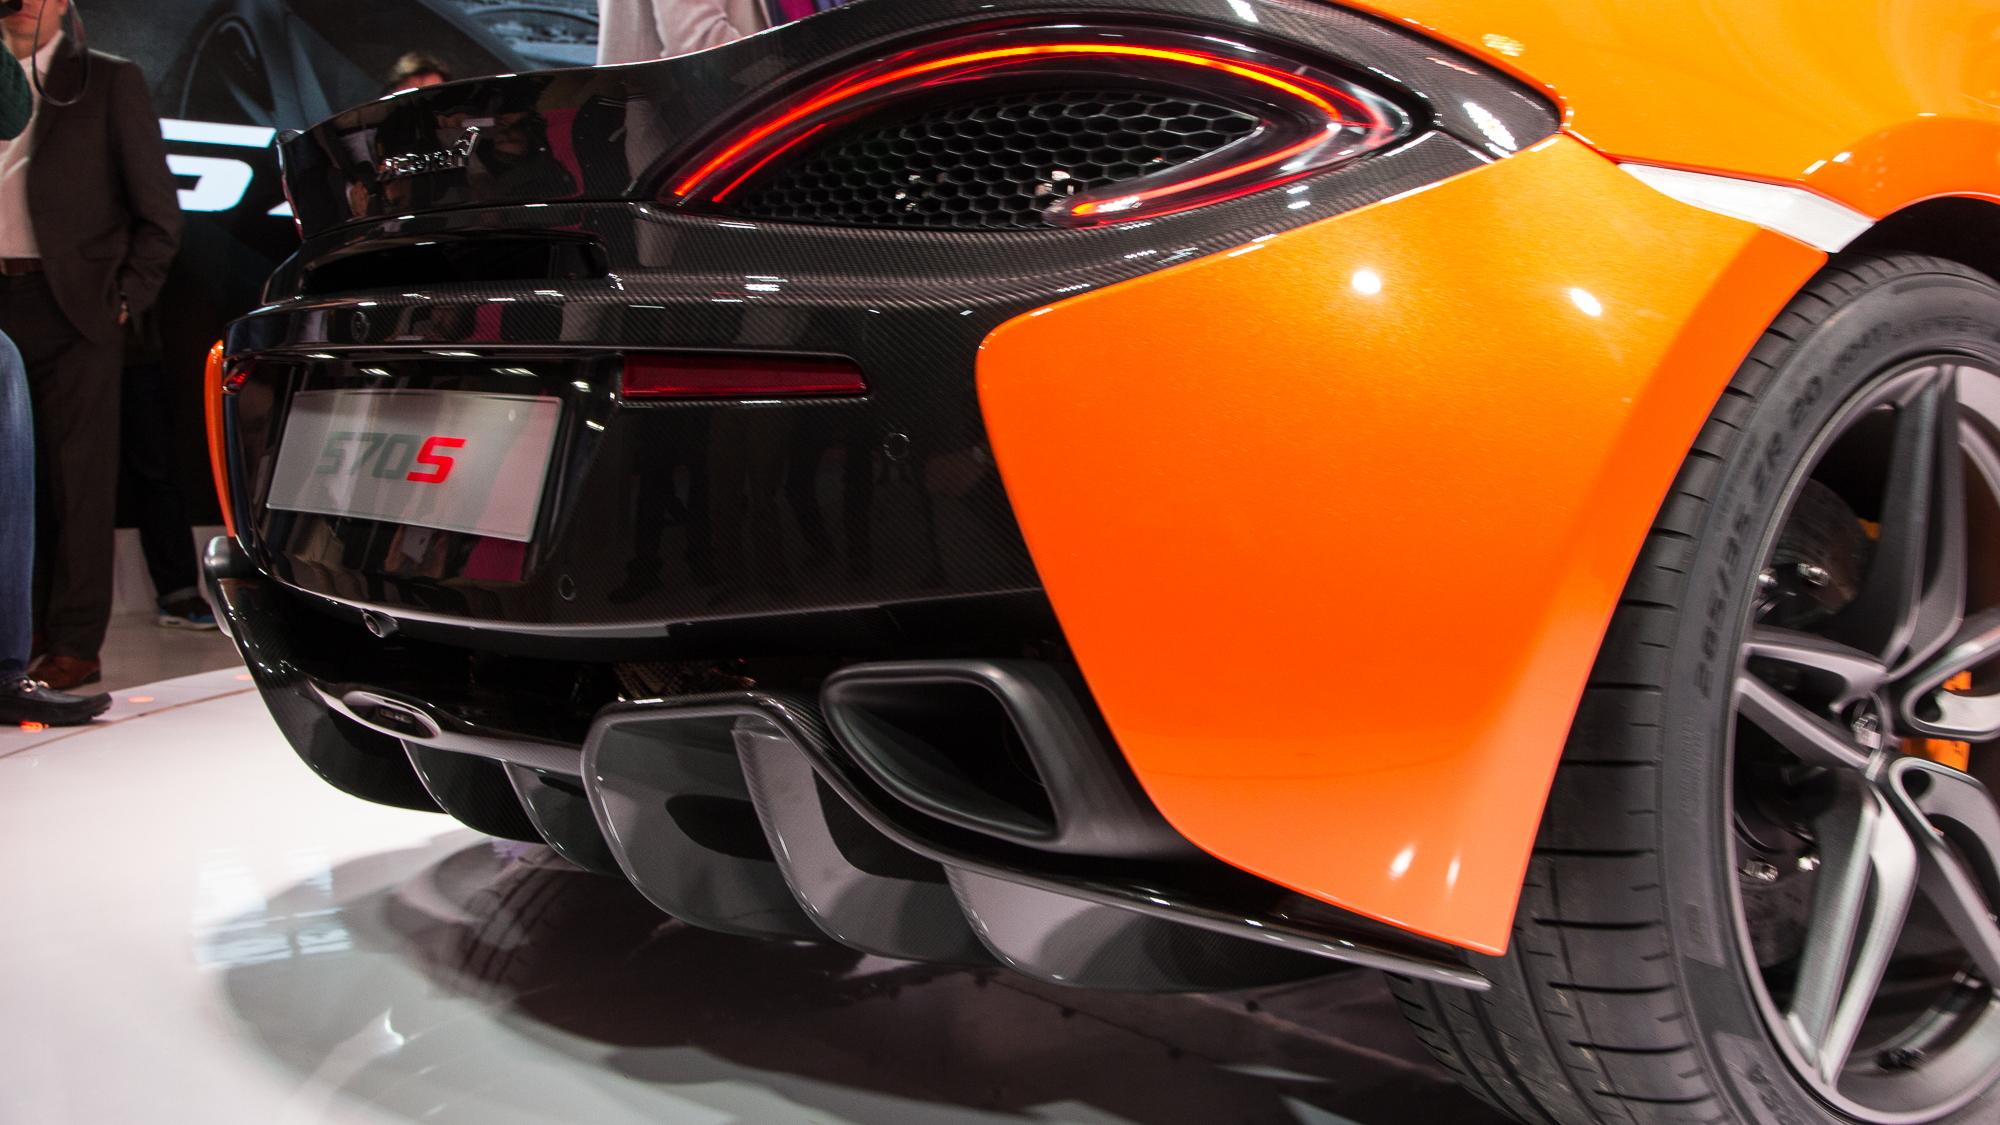 McLaren 570S Coupe live photos, 2015 New York Auto Show